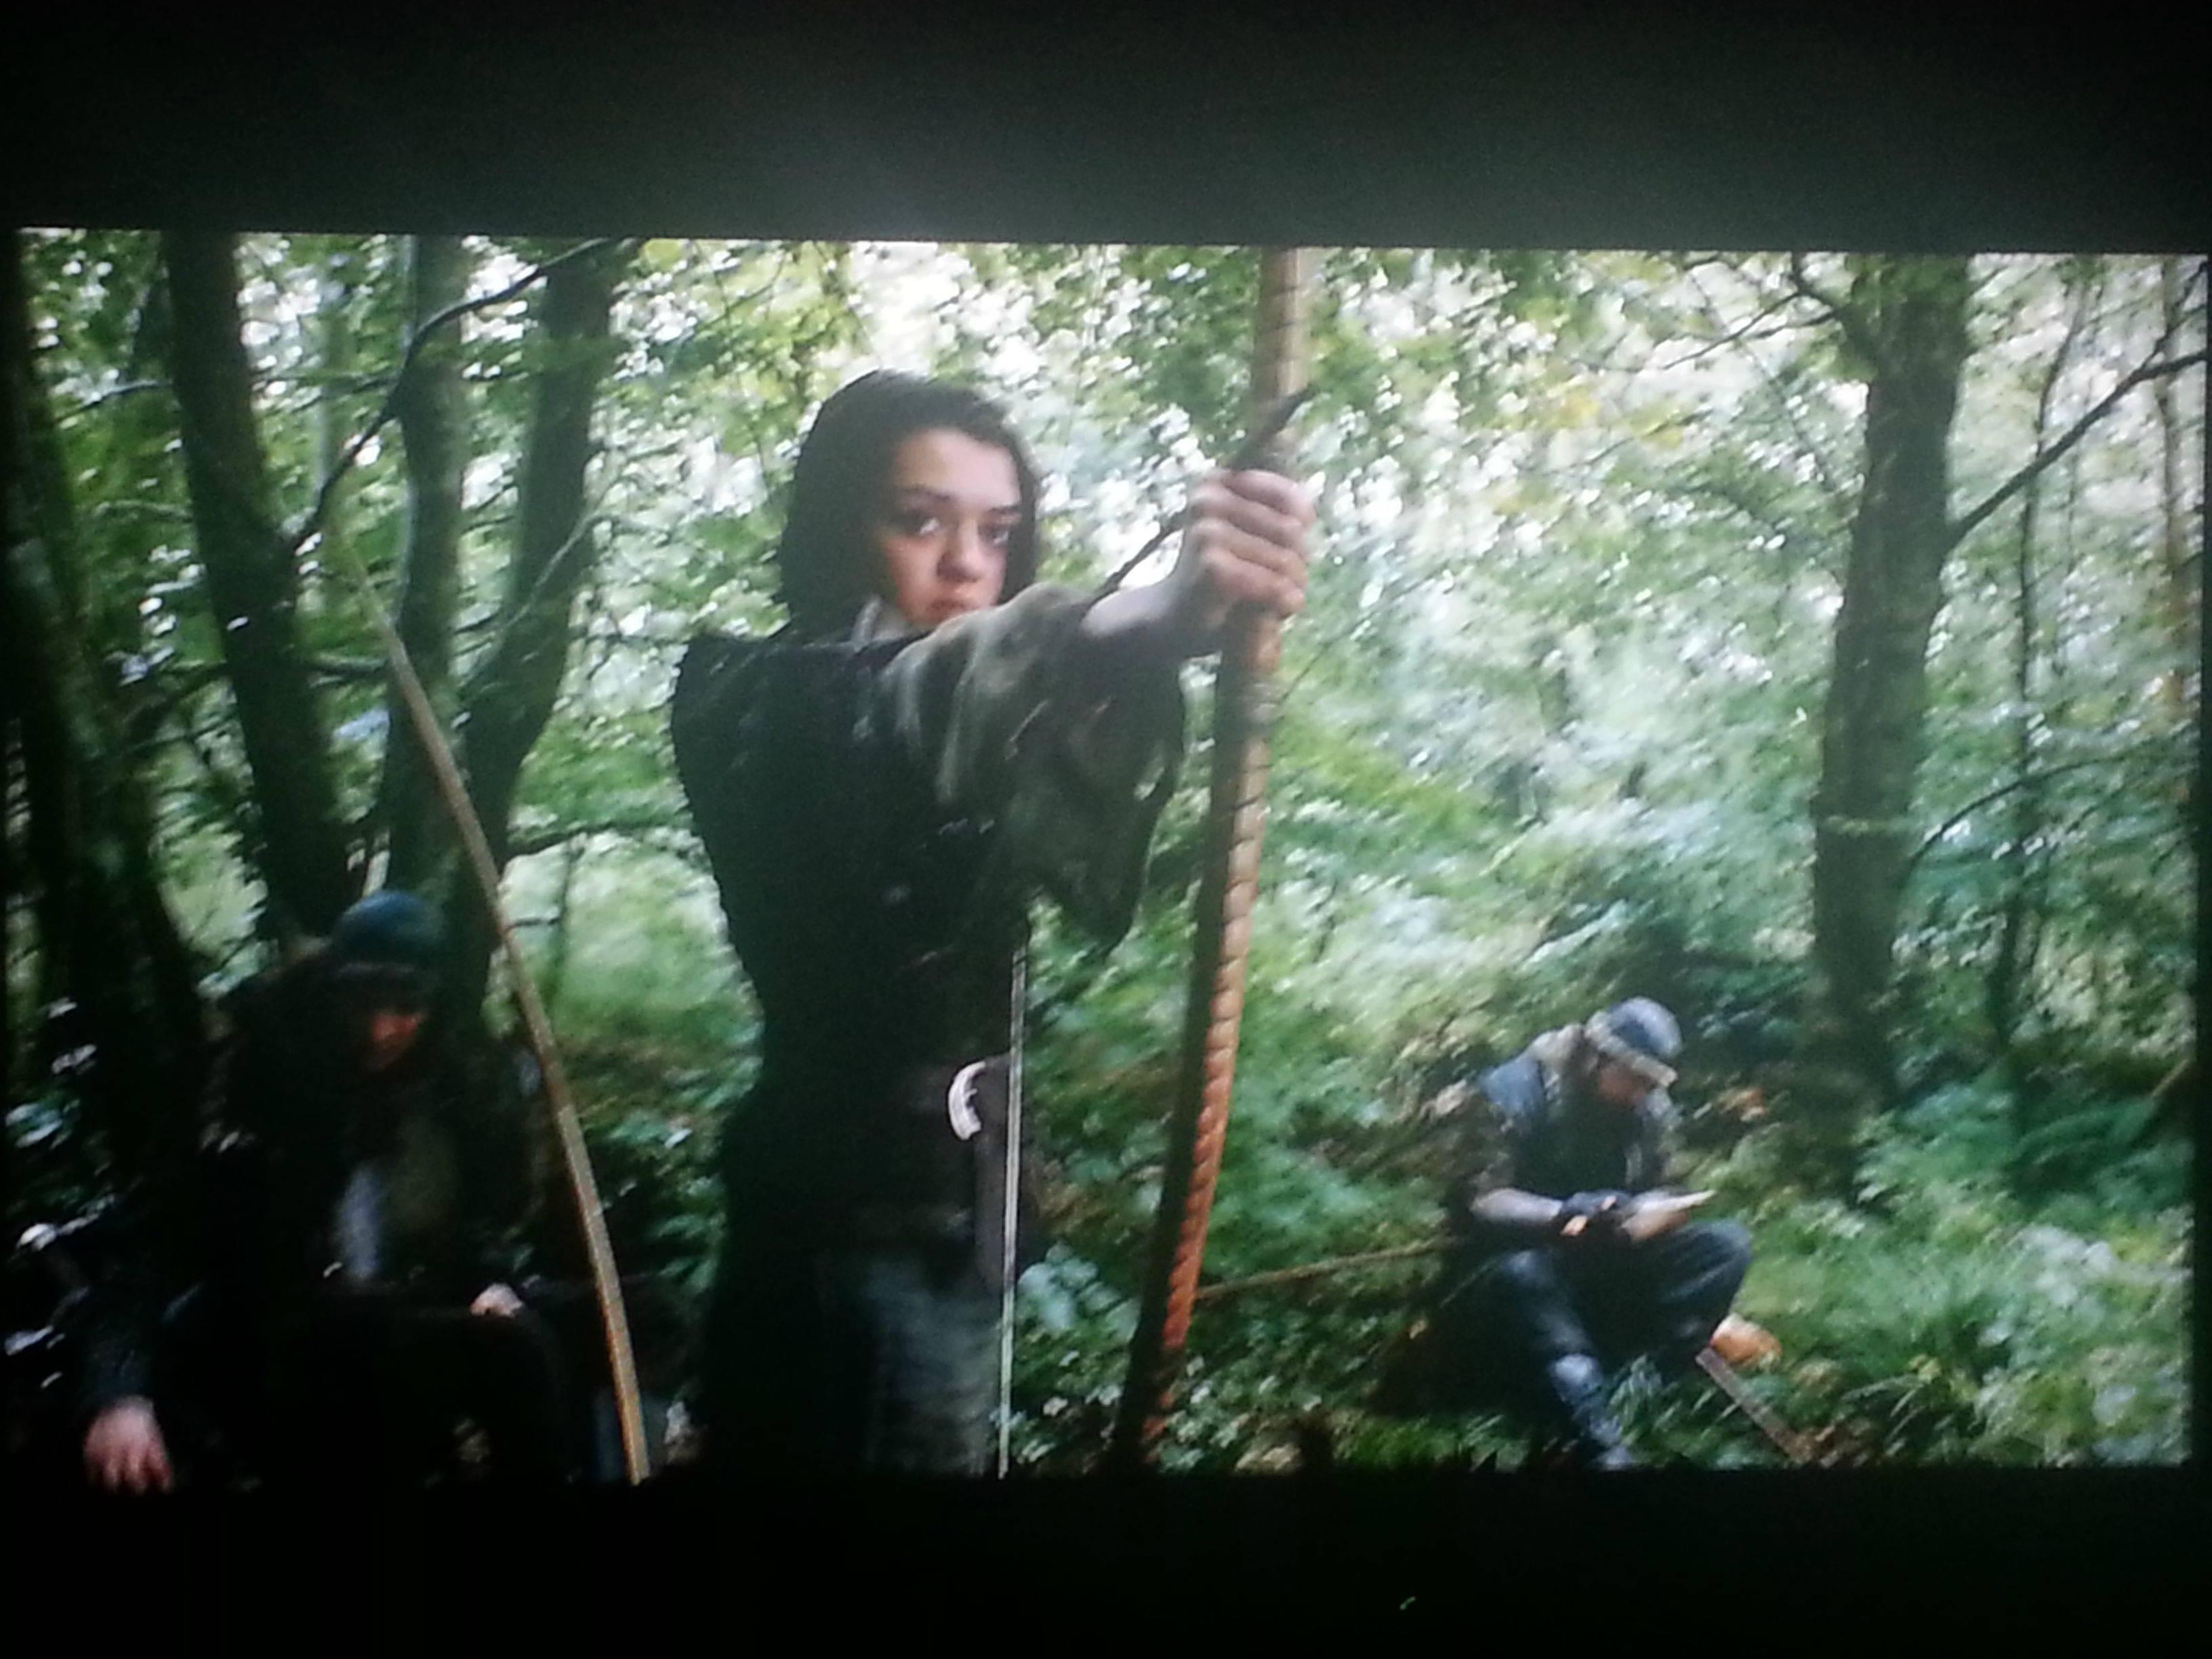 Maisie Williams Game of Thrones The Climb